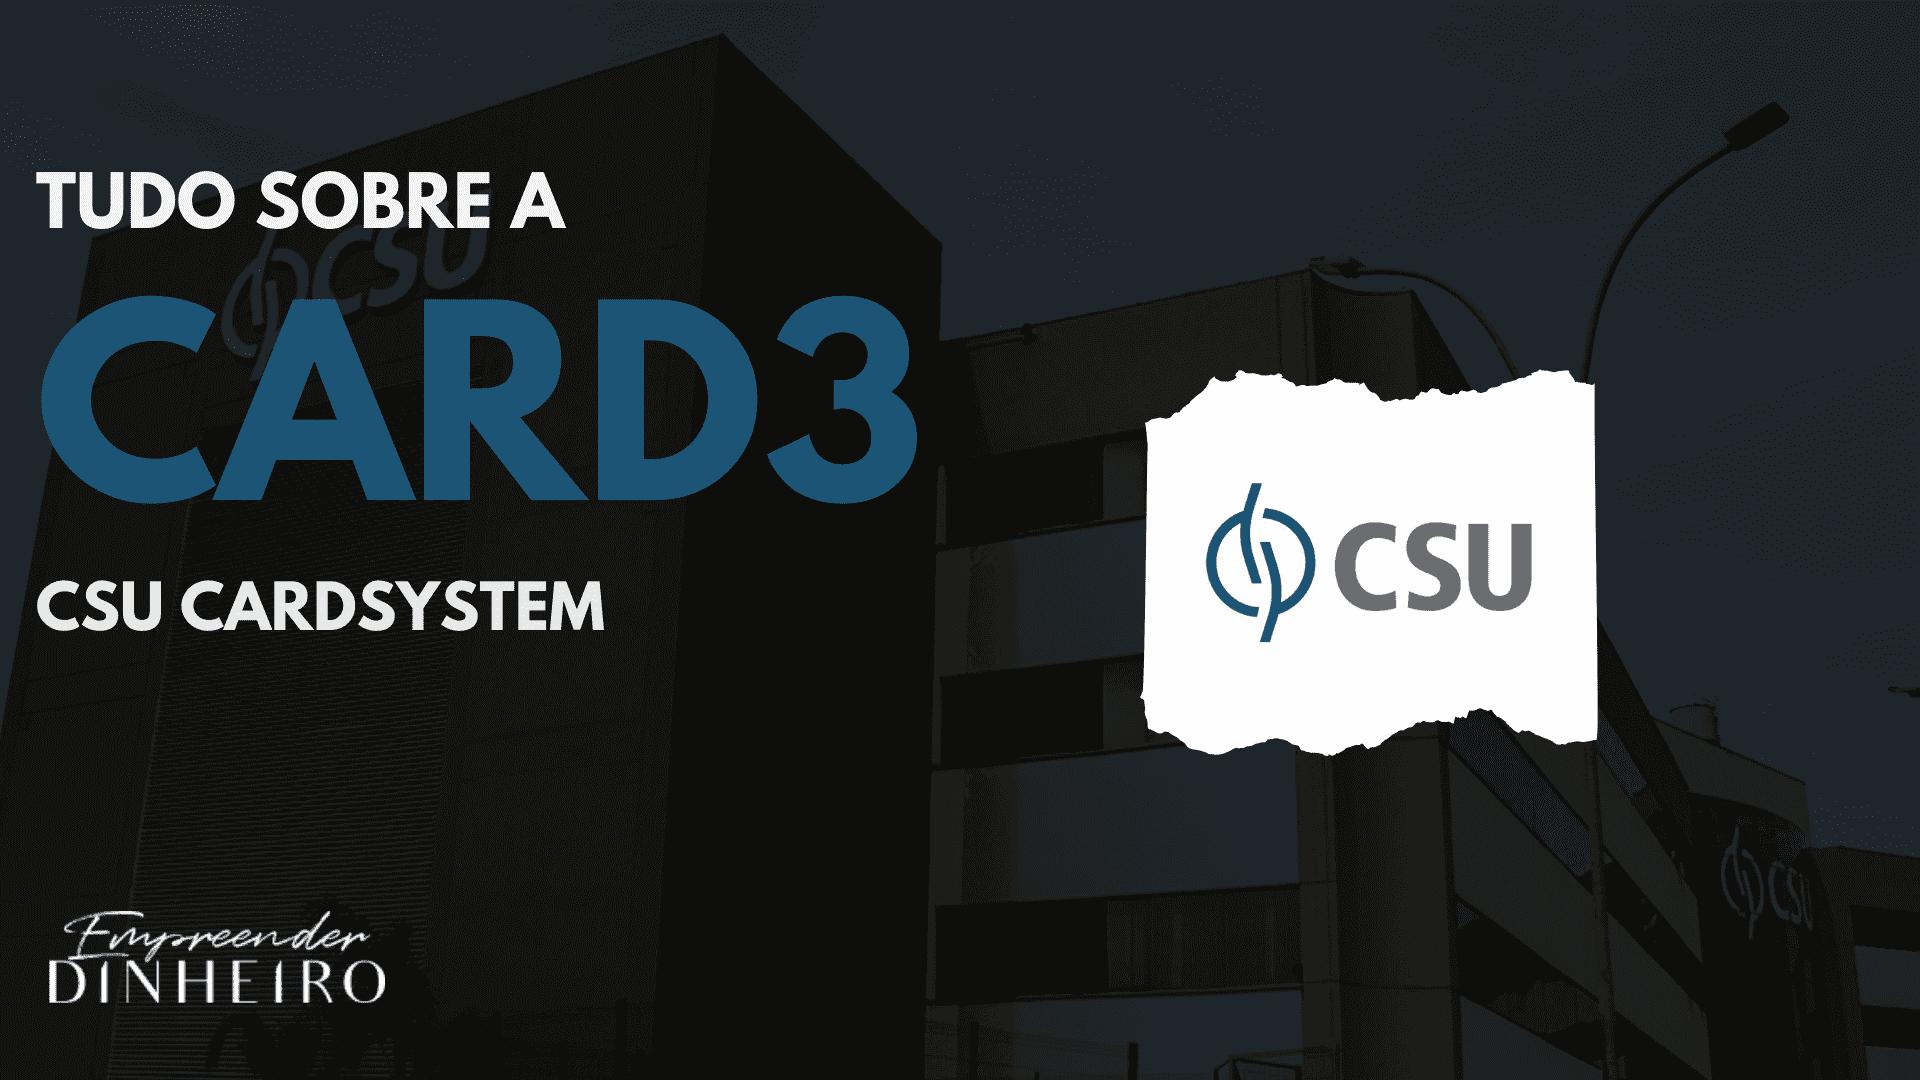 CSU CARDSYSTEM CARD3 INVESTIMENTOS